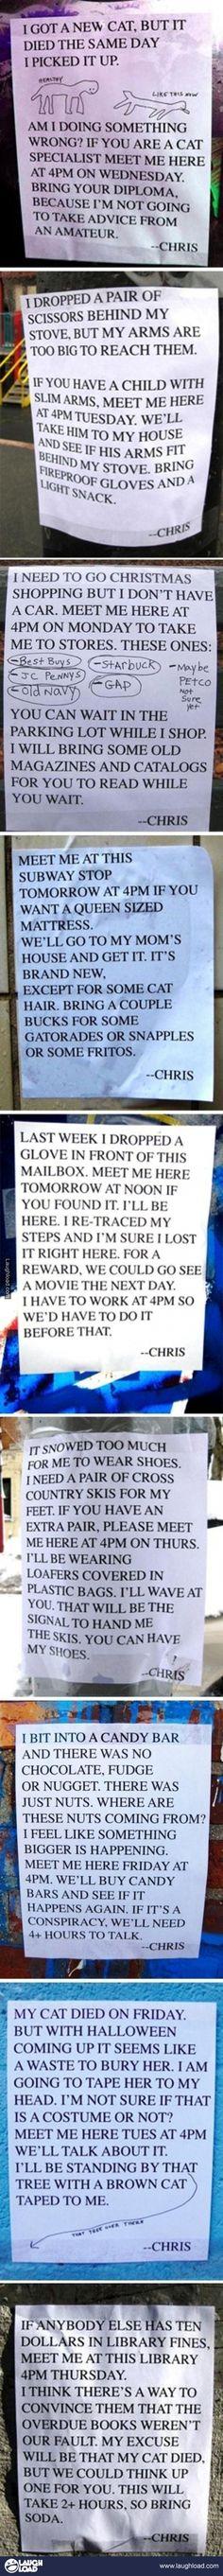 I want to meet Chris.